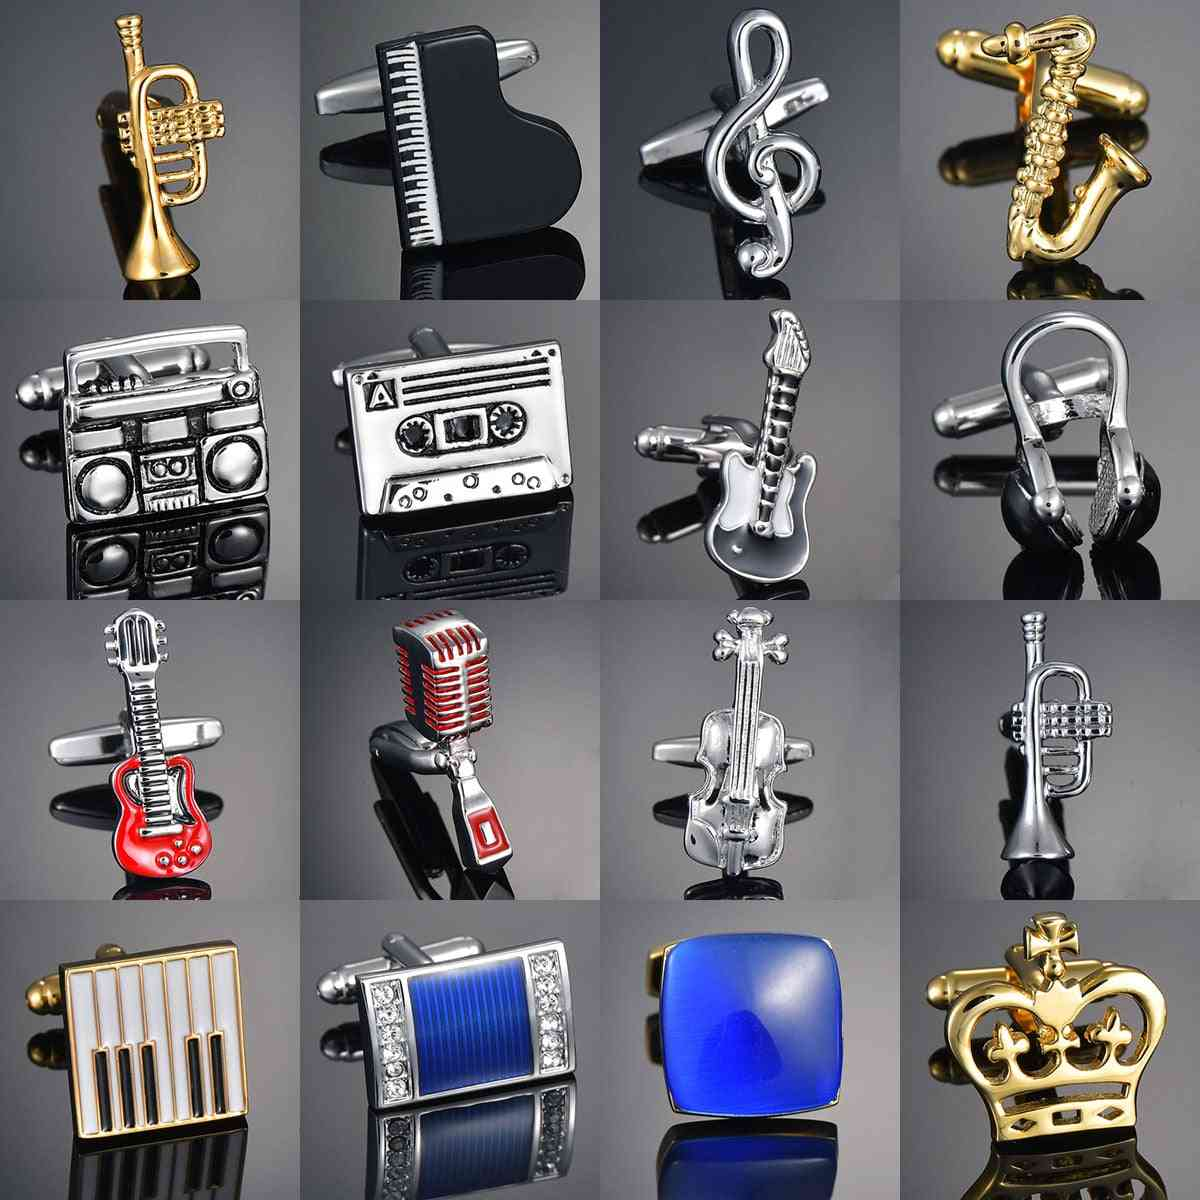 Guitar/music/recorder/microphone/trumpet Cufflinks Music Design Bouton